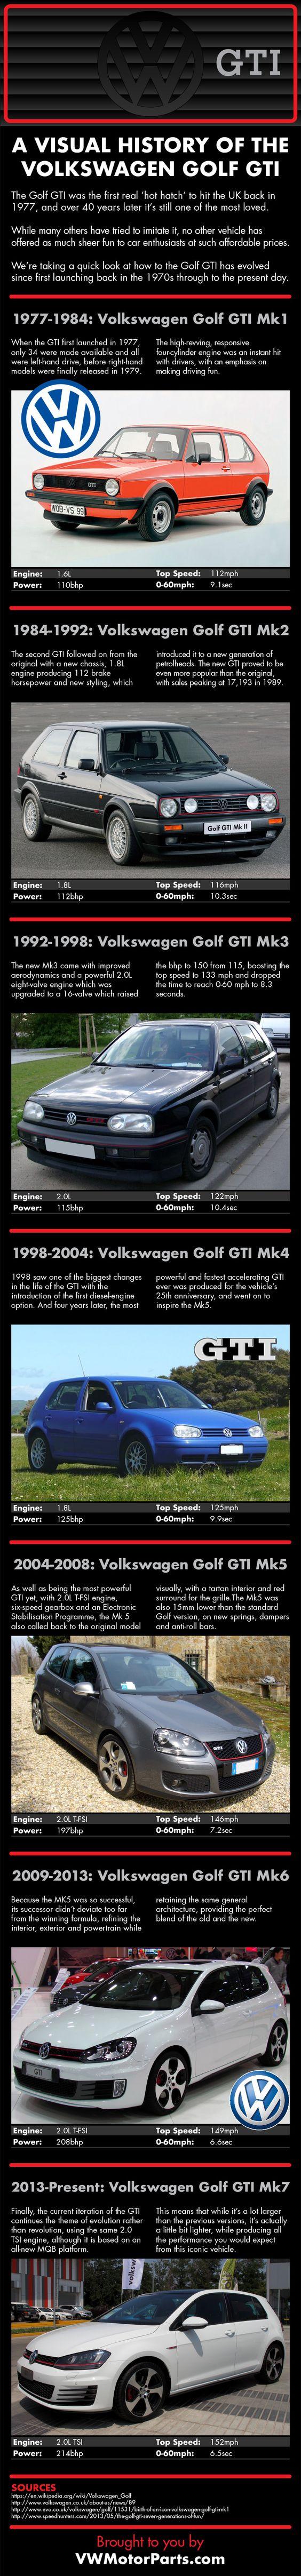 VWVortex 83 Mk I GTI Original 54k miles $8500 Canada